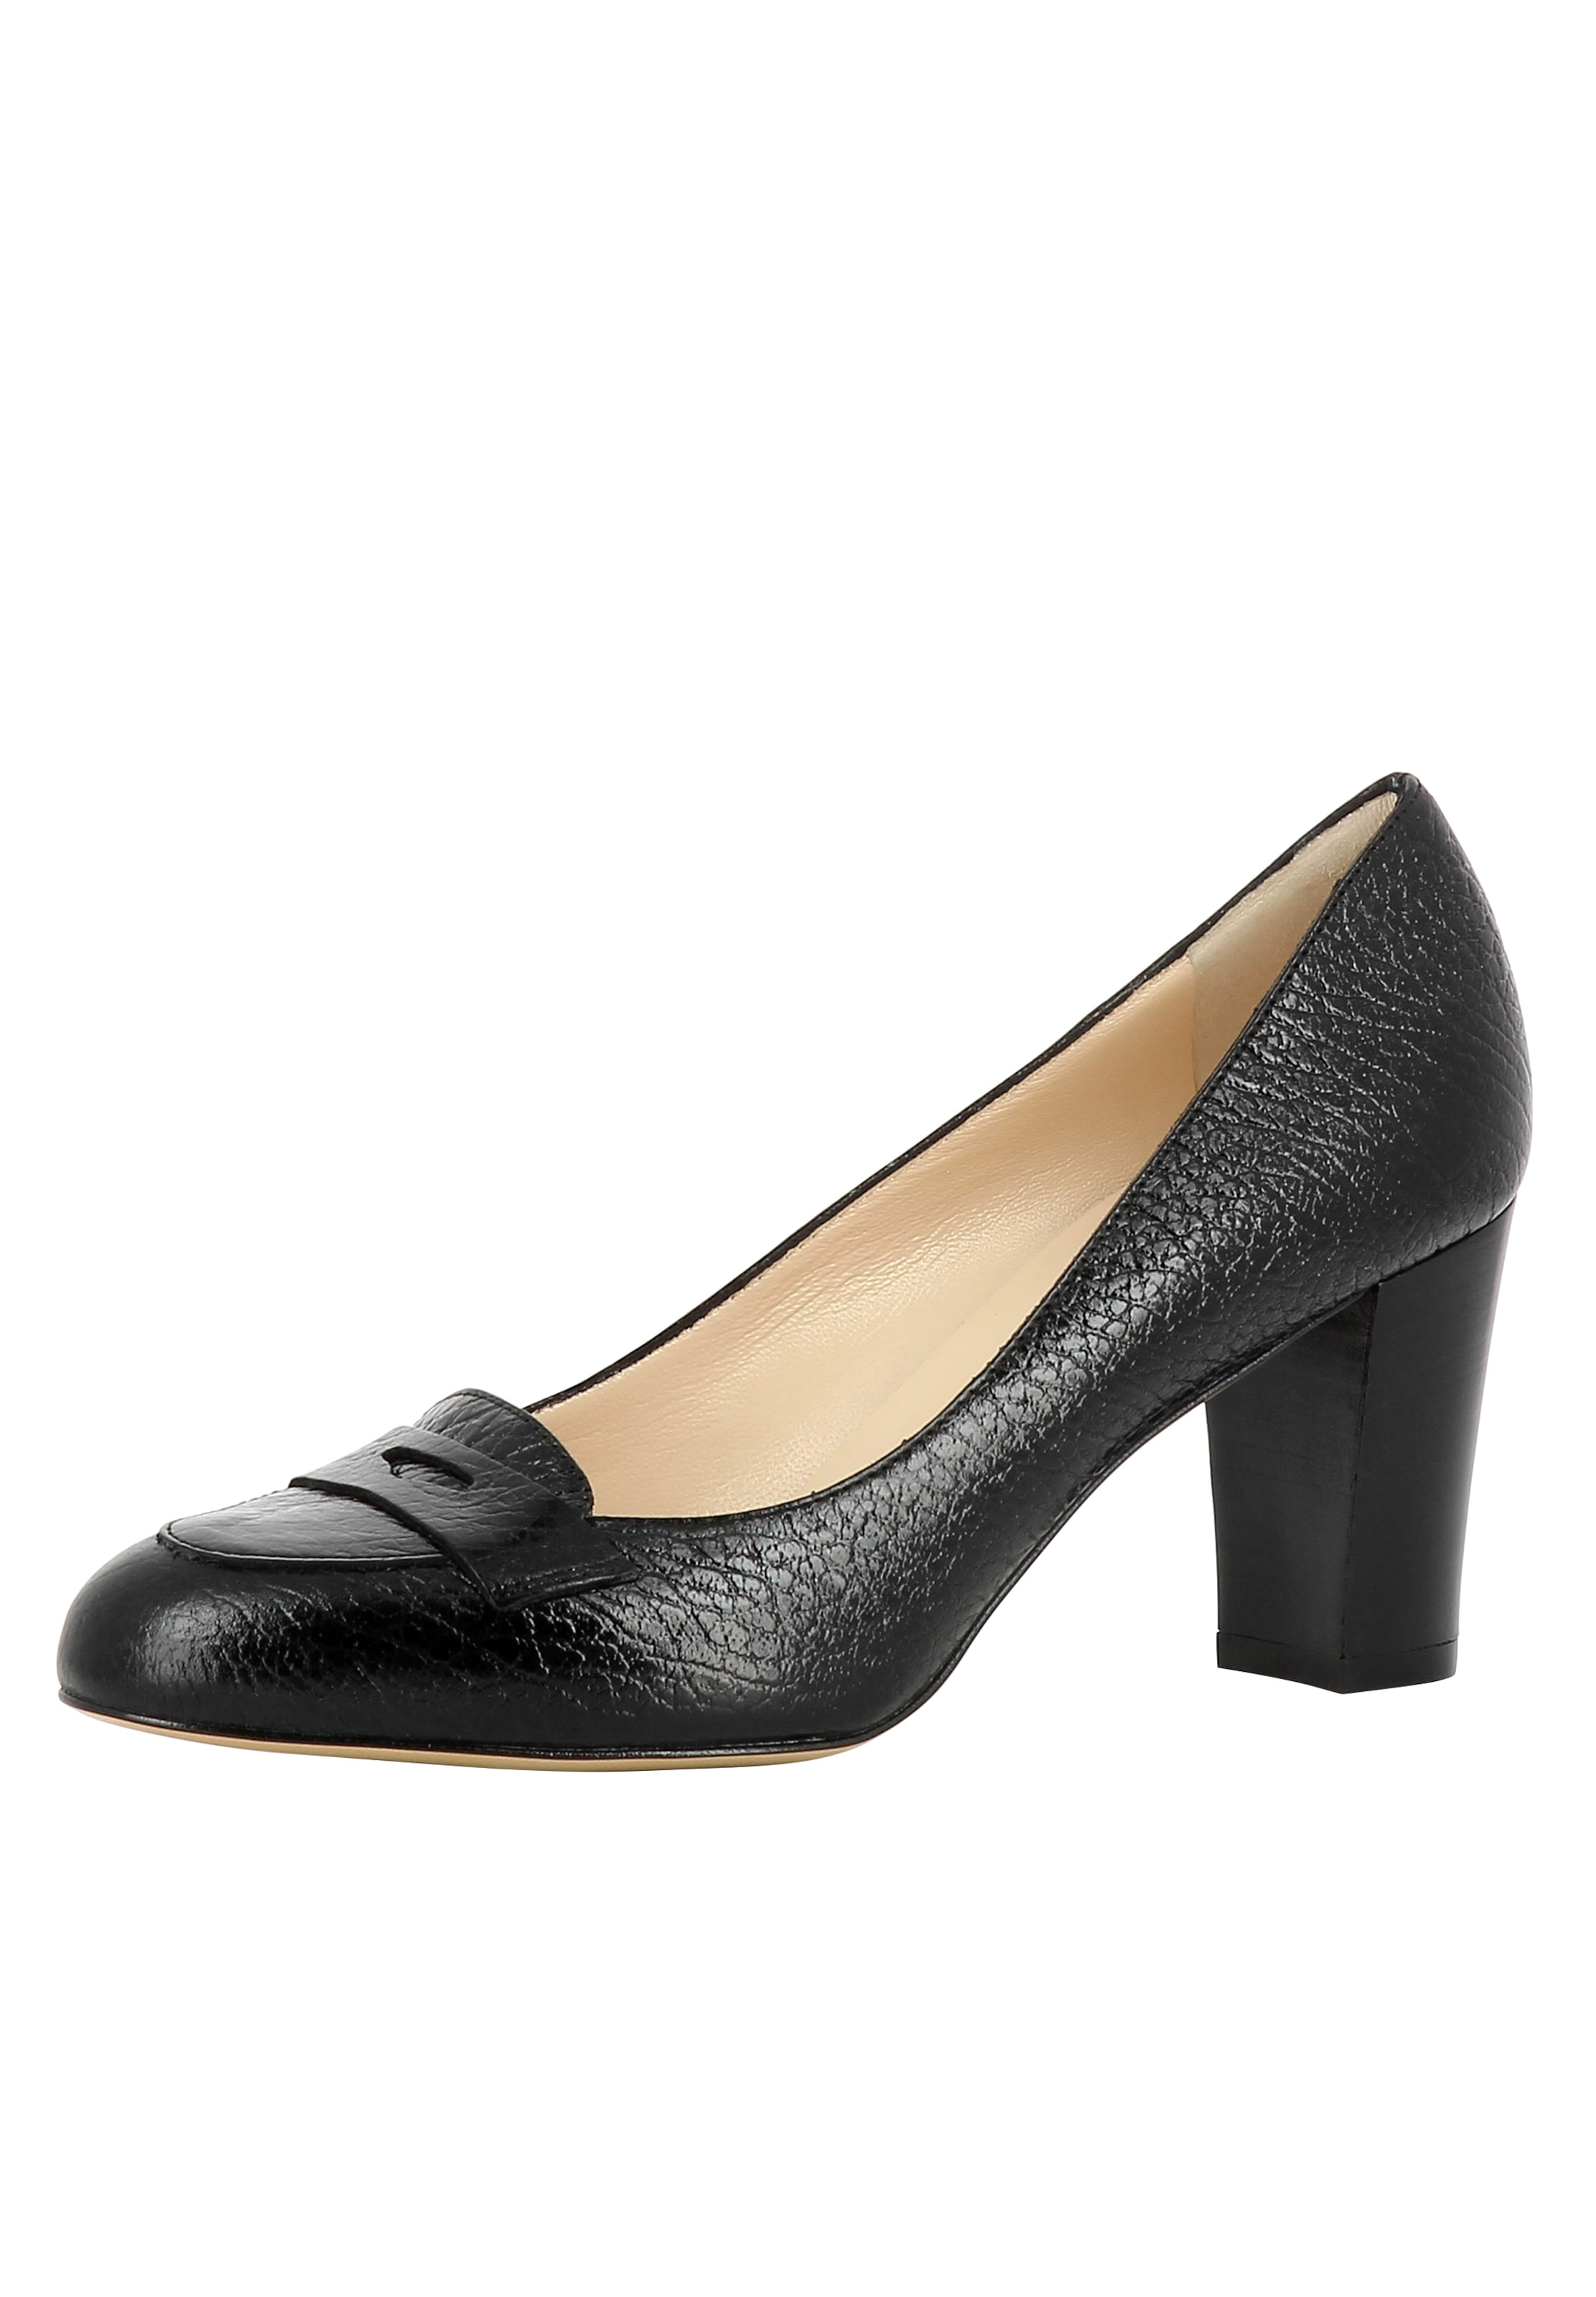 Haltbare Mode billige Schuhe EVITA | Damen Pumps 'BIANCA' Schuhe Gut getragene Schuhe